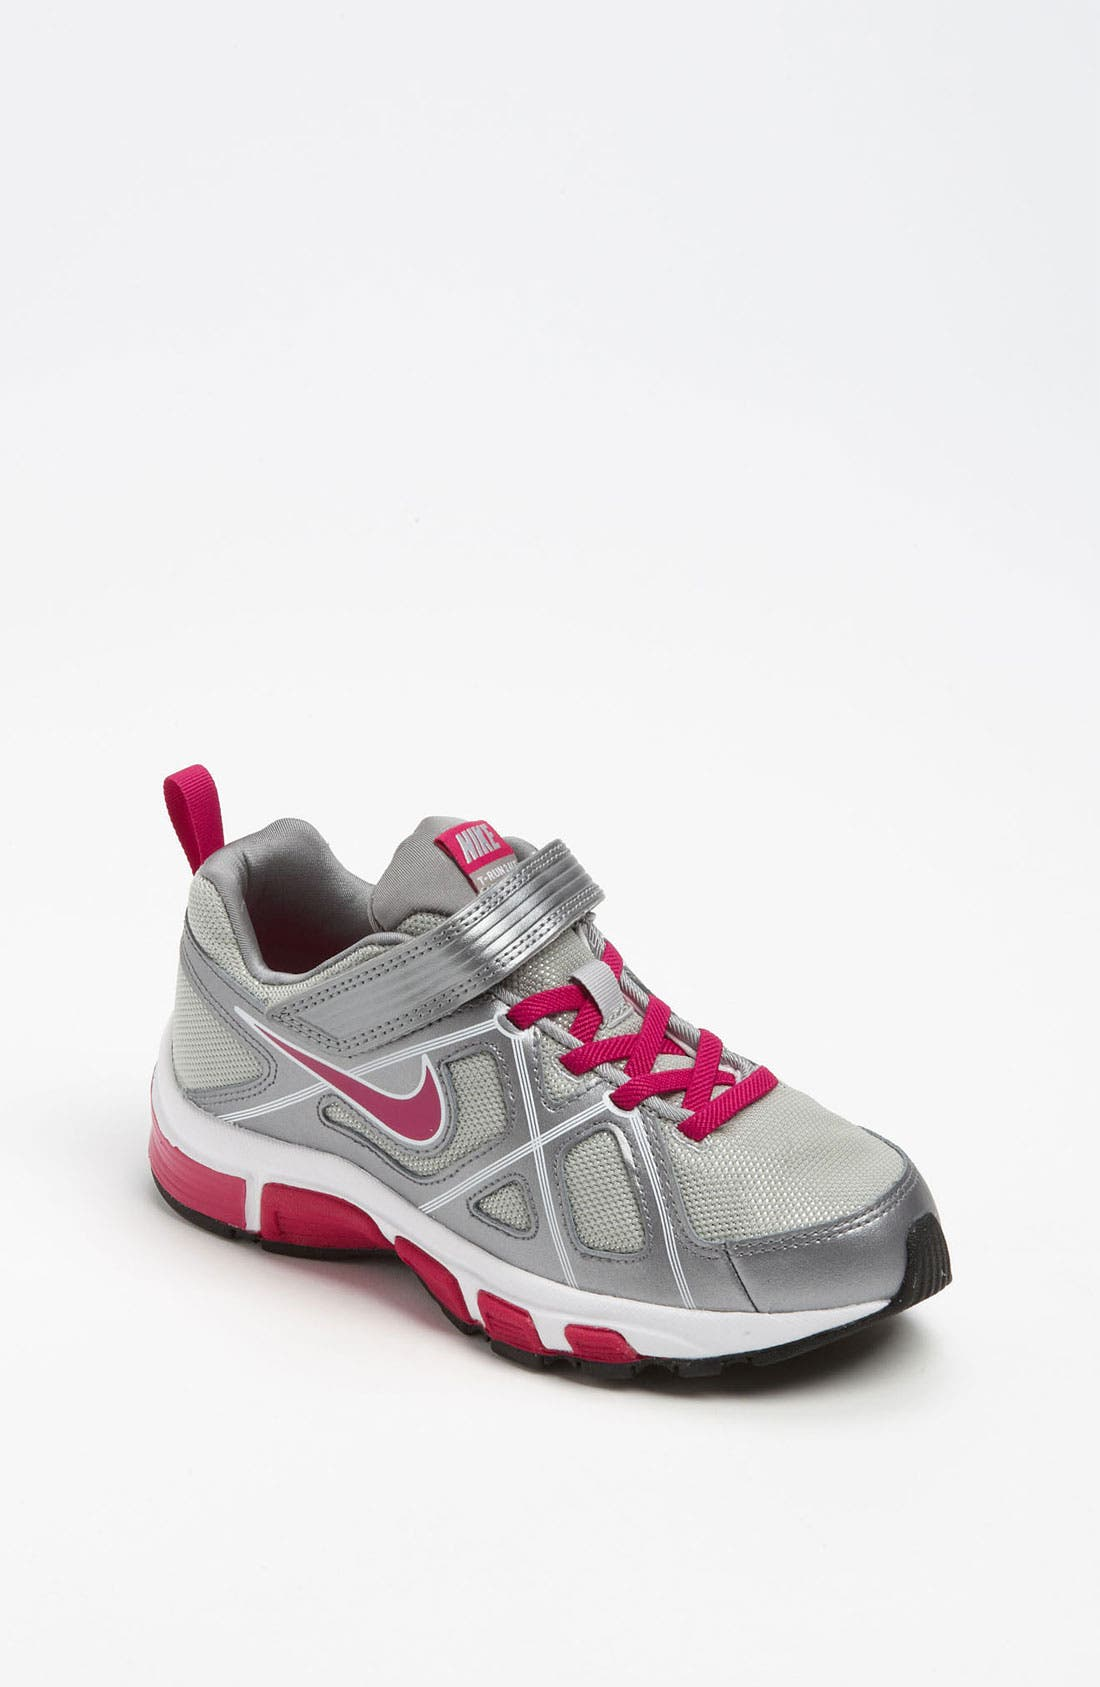 Alternate Image 1 Selected - Nike 'T-Run 3 Alt' Running Shoe (Toddler, Little Kid & Big Kid) (Special Purchase)